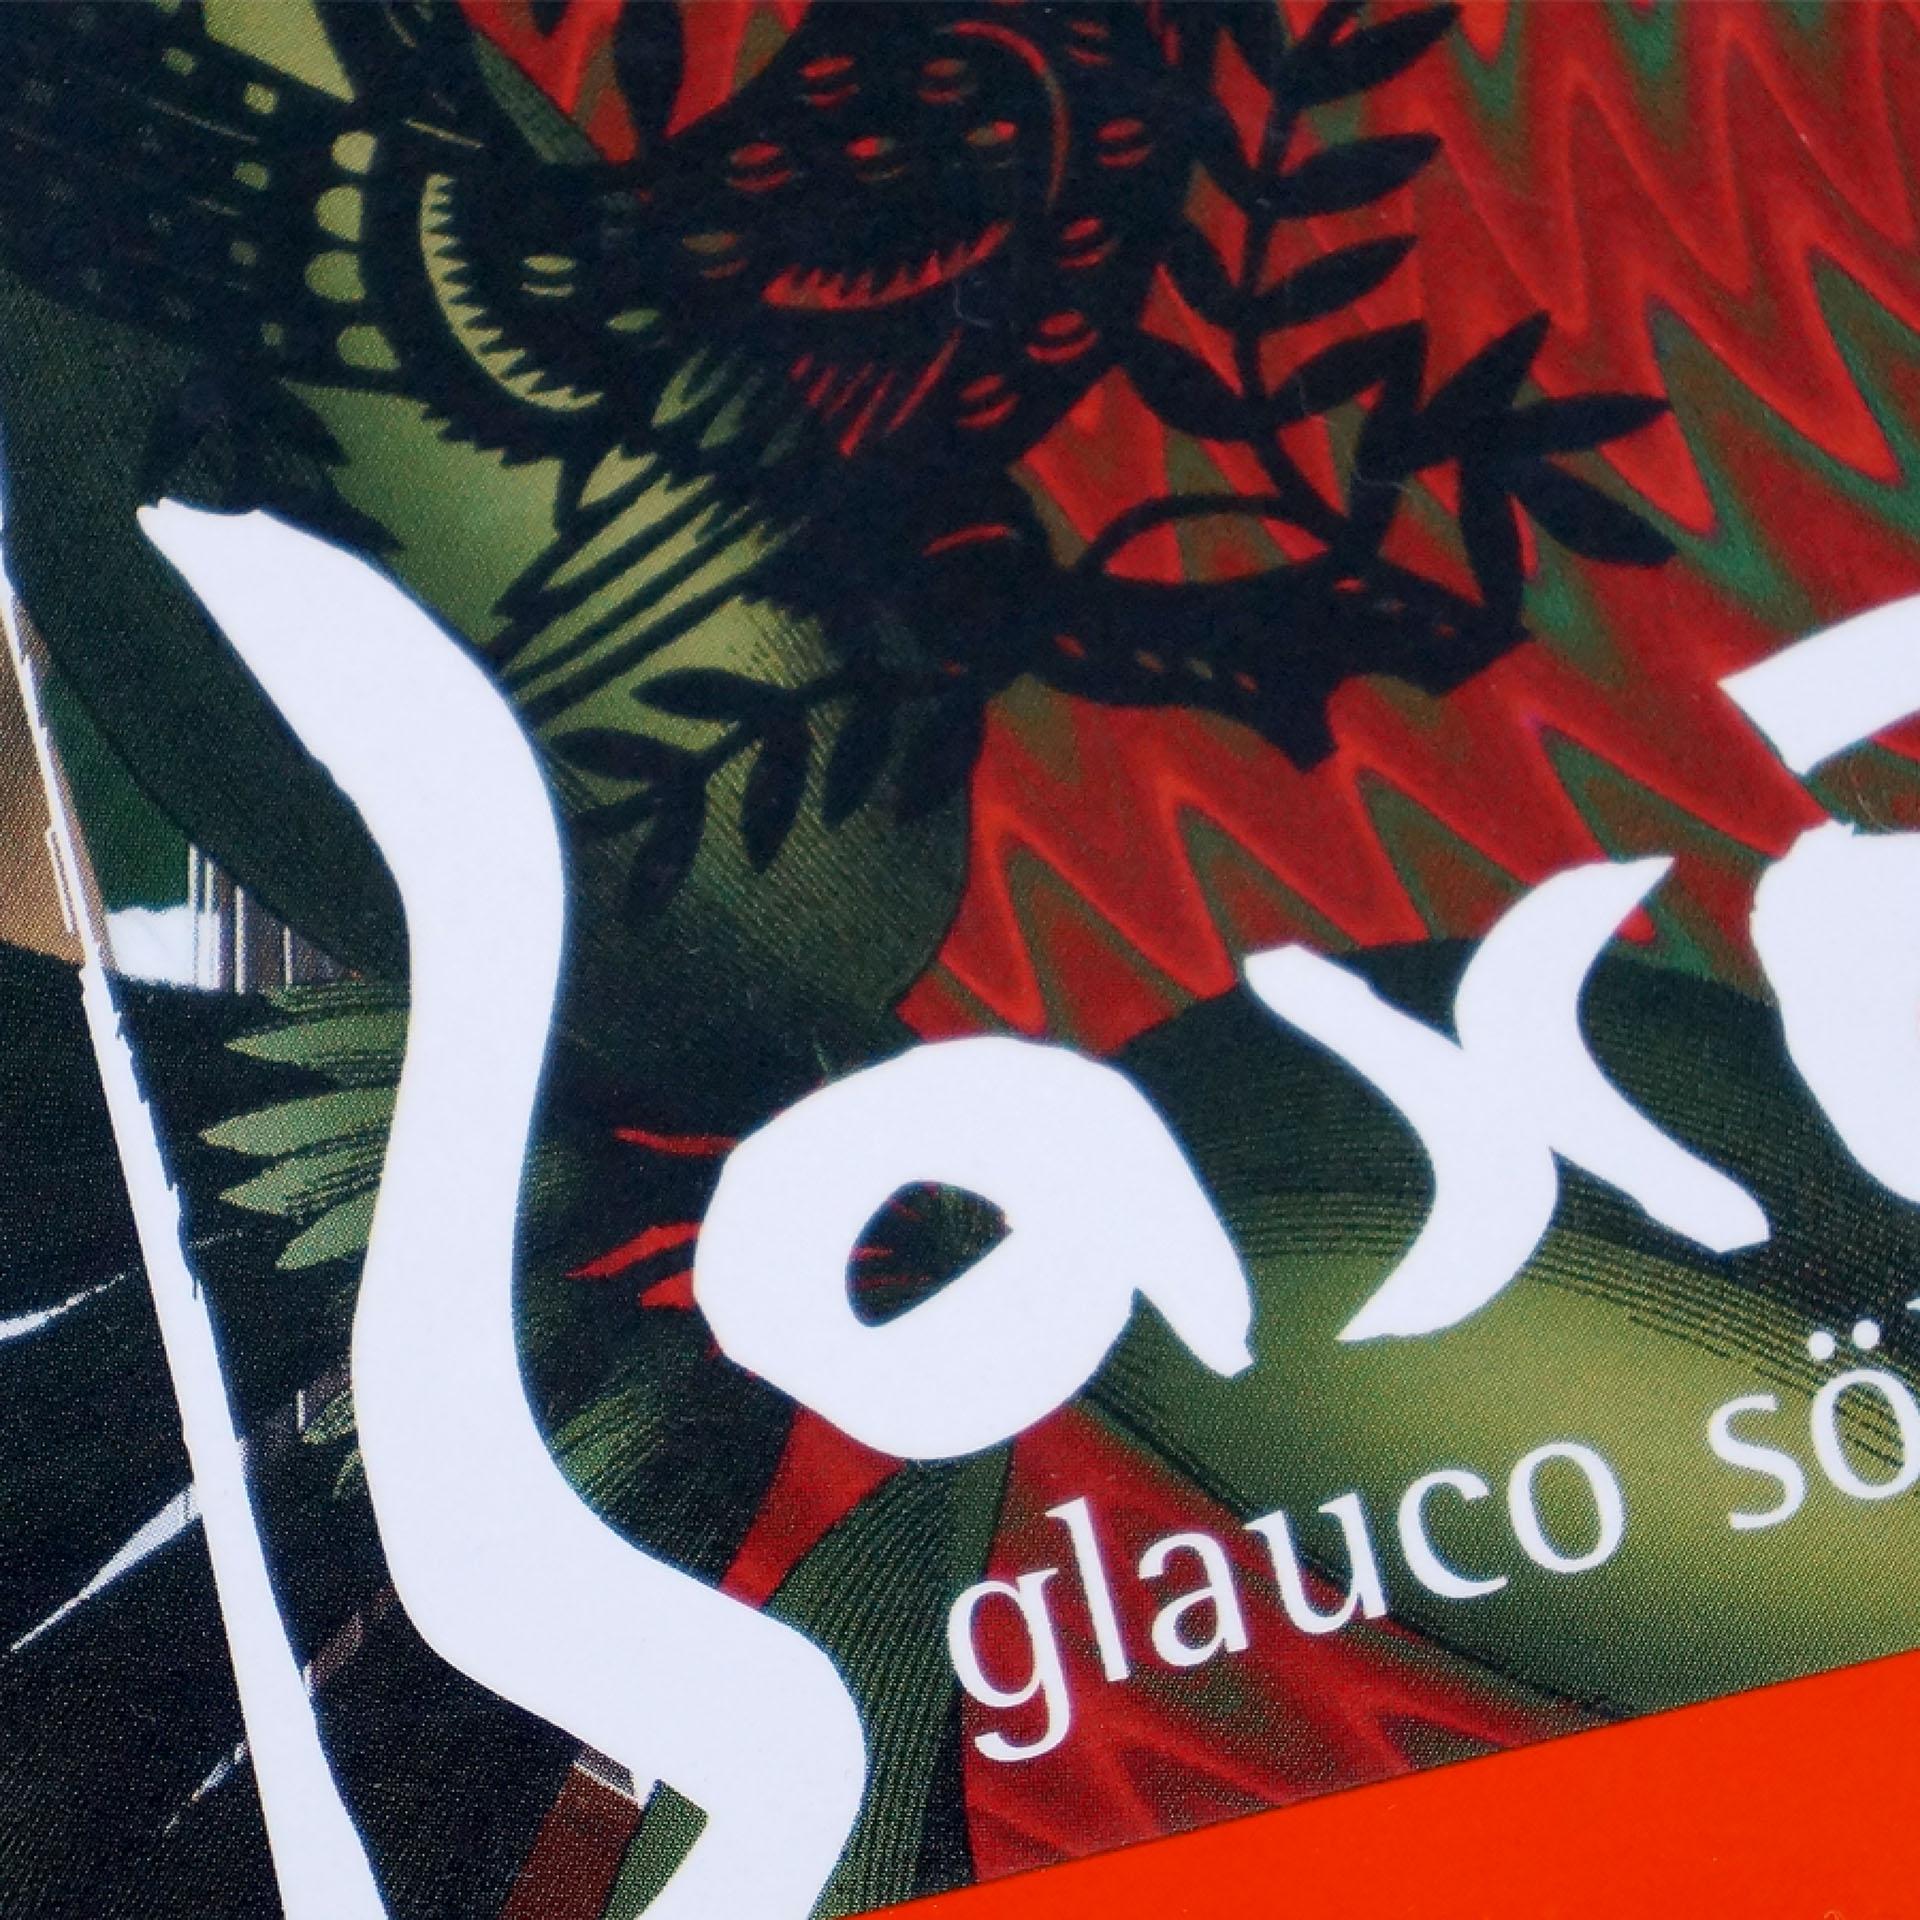 Glauco Solter CD Baxó